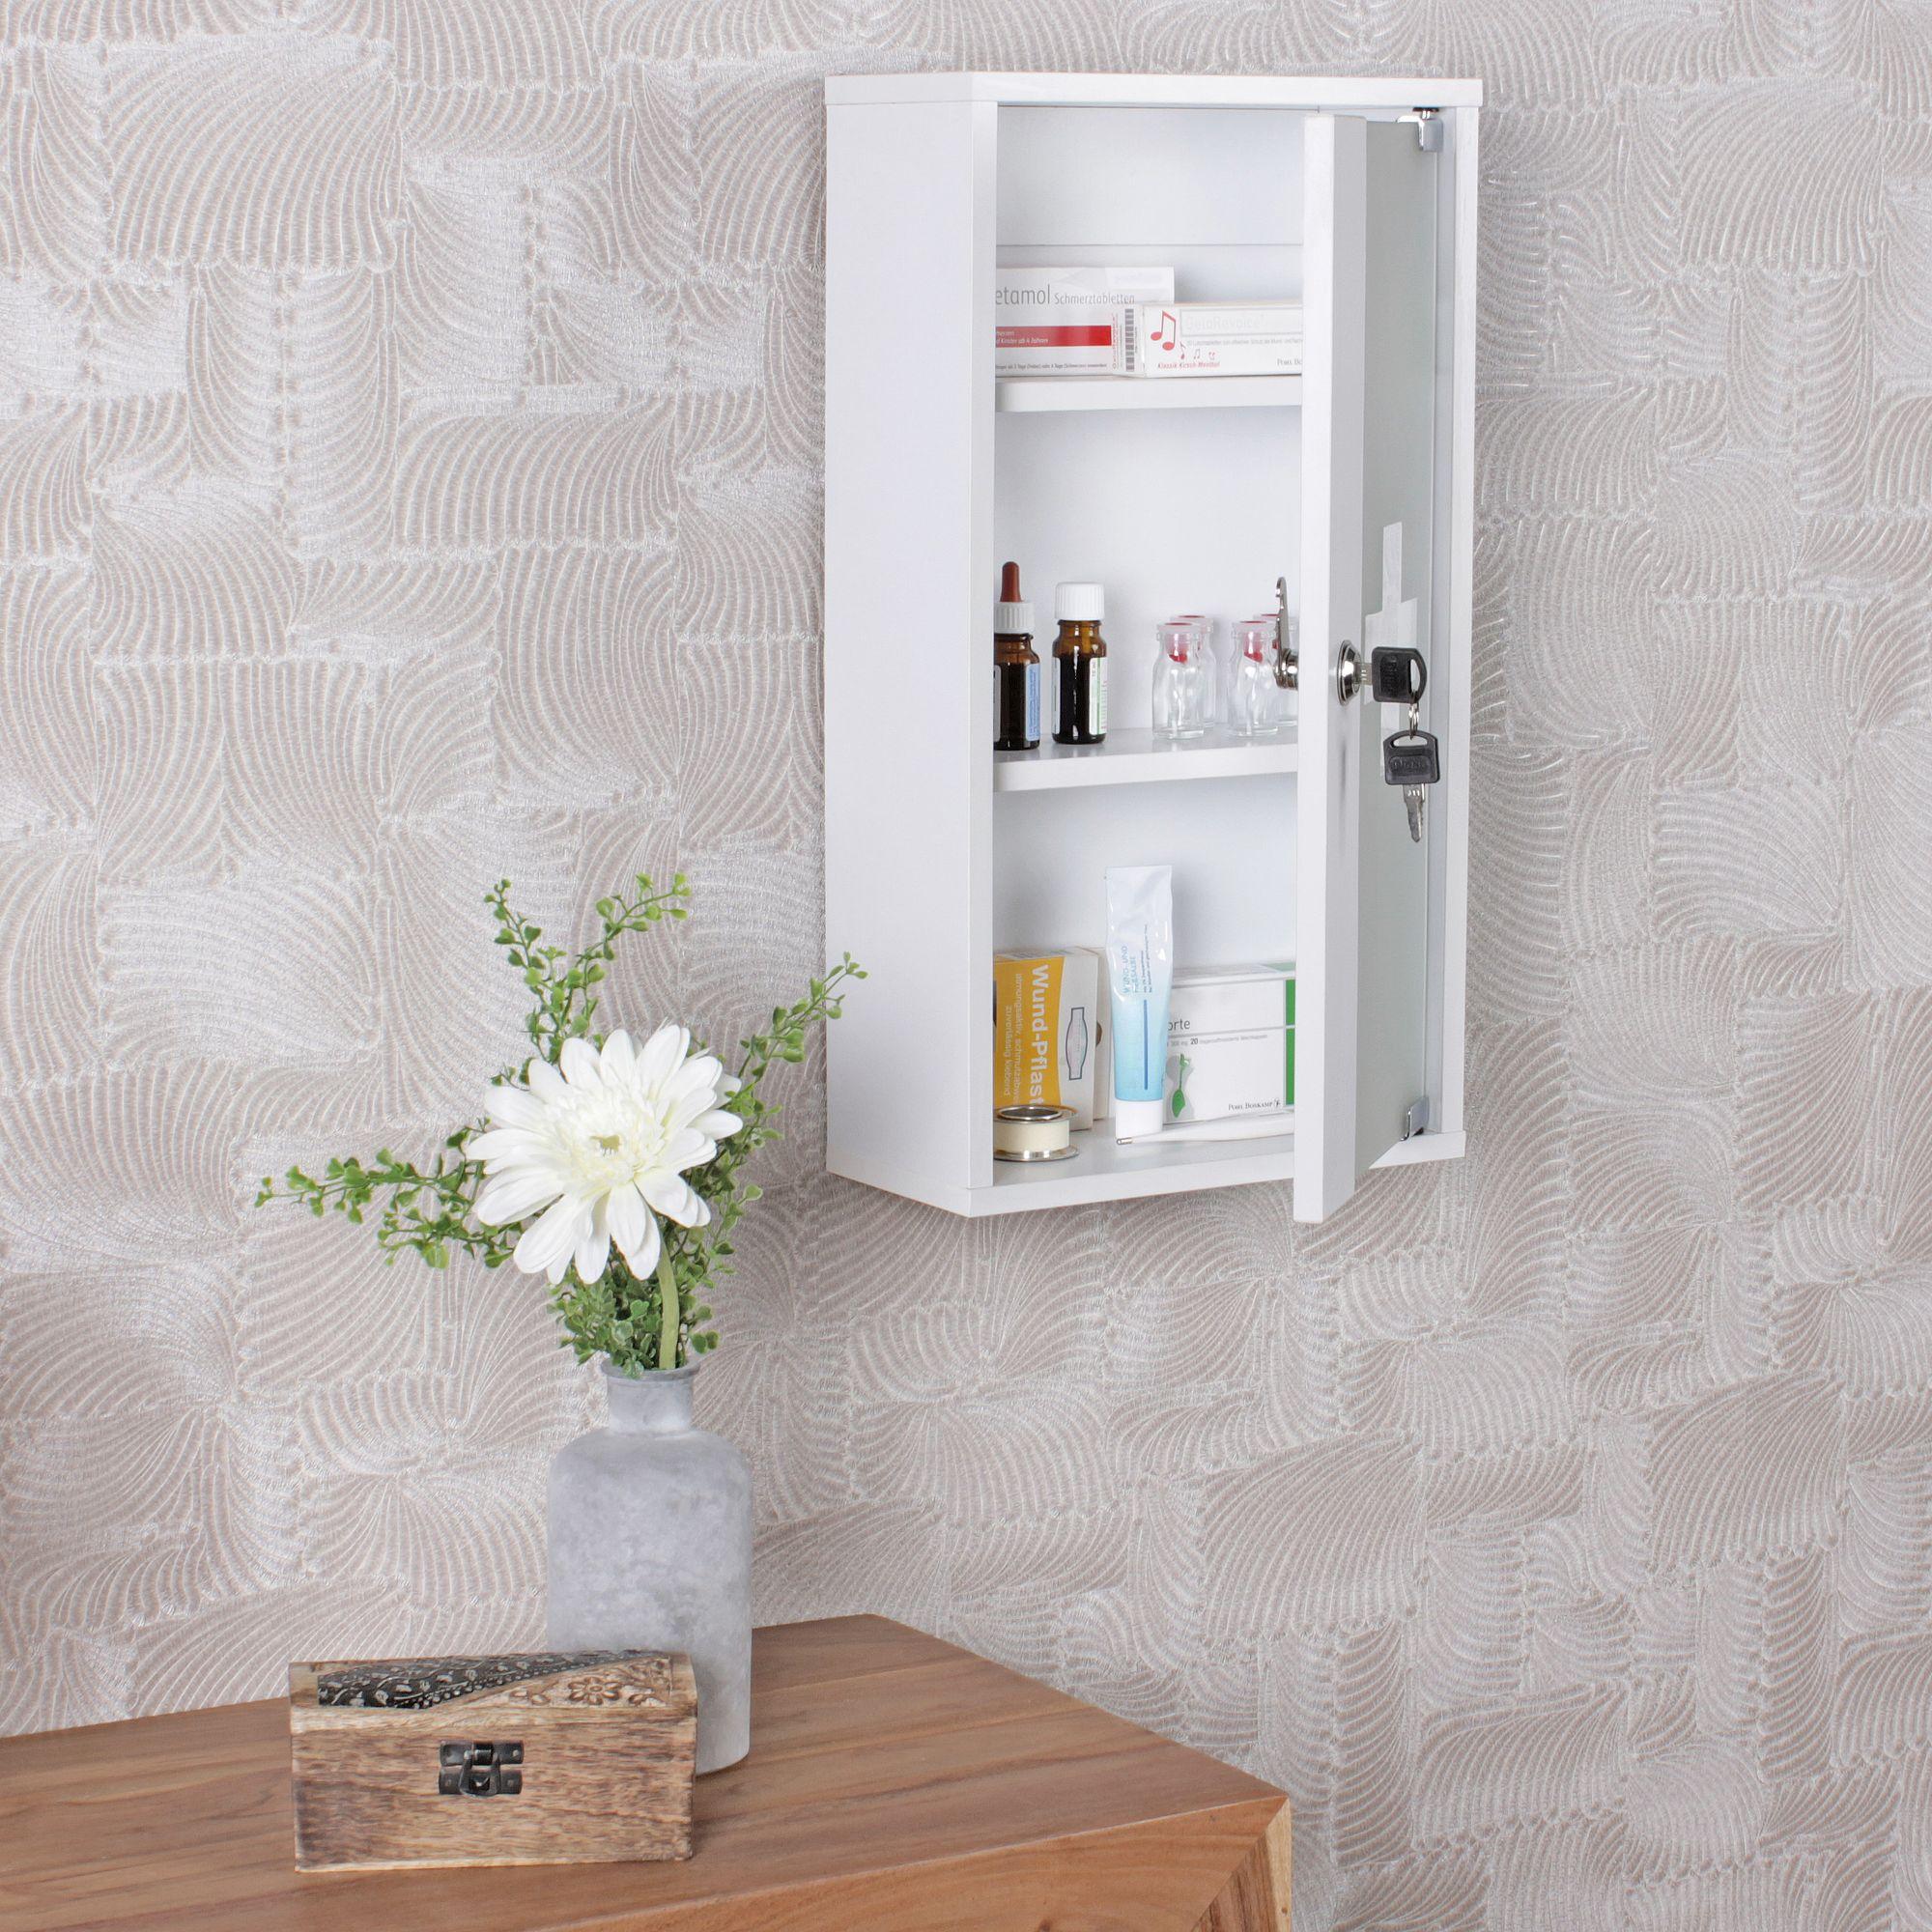 medizinschrank abschlie bar erste hilfe schrank medikamentenschrank hausapotheke ebay. Black Bedroom Furniture Sets. Home Design Ideas